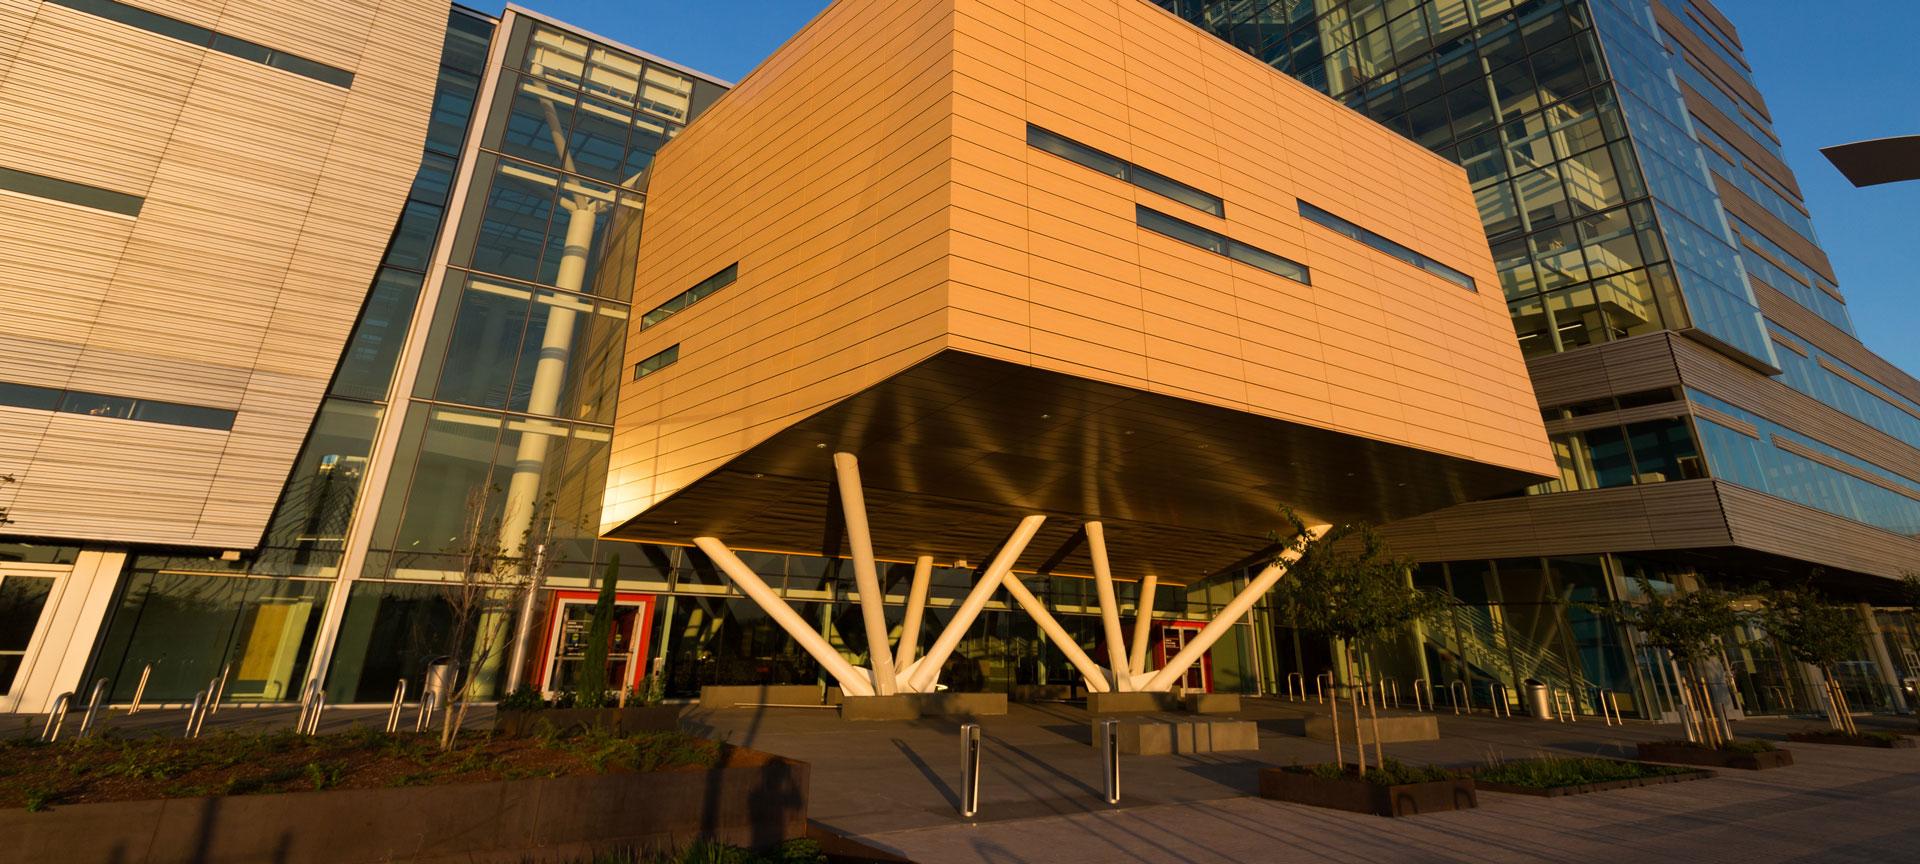 Robertson Life Sciences Building